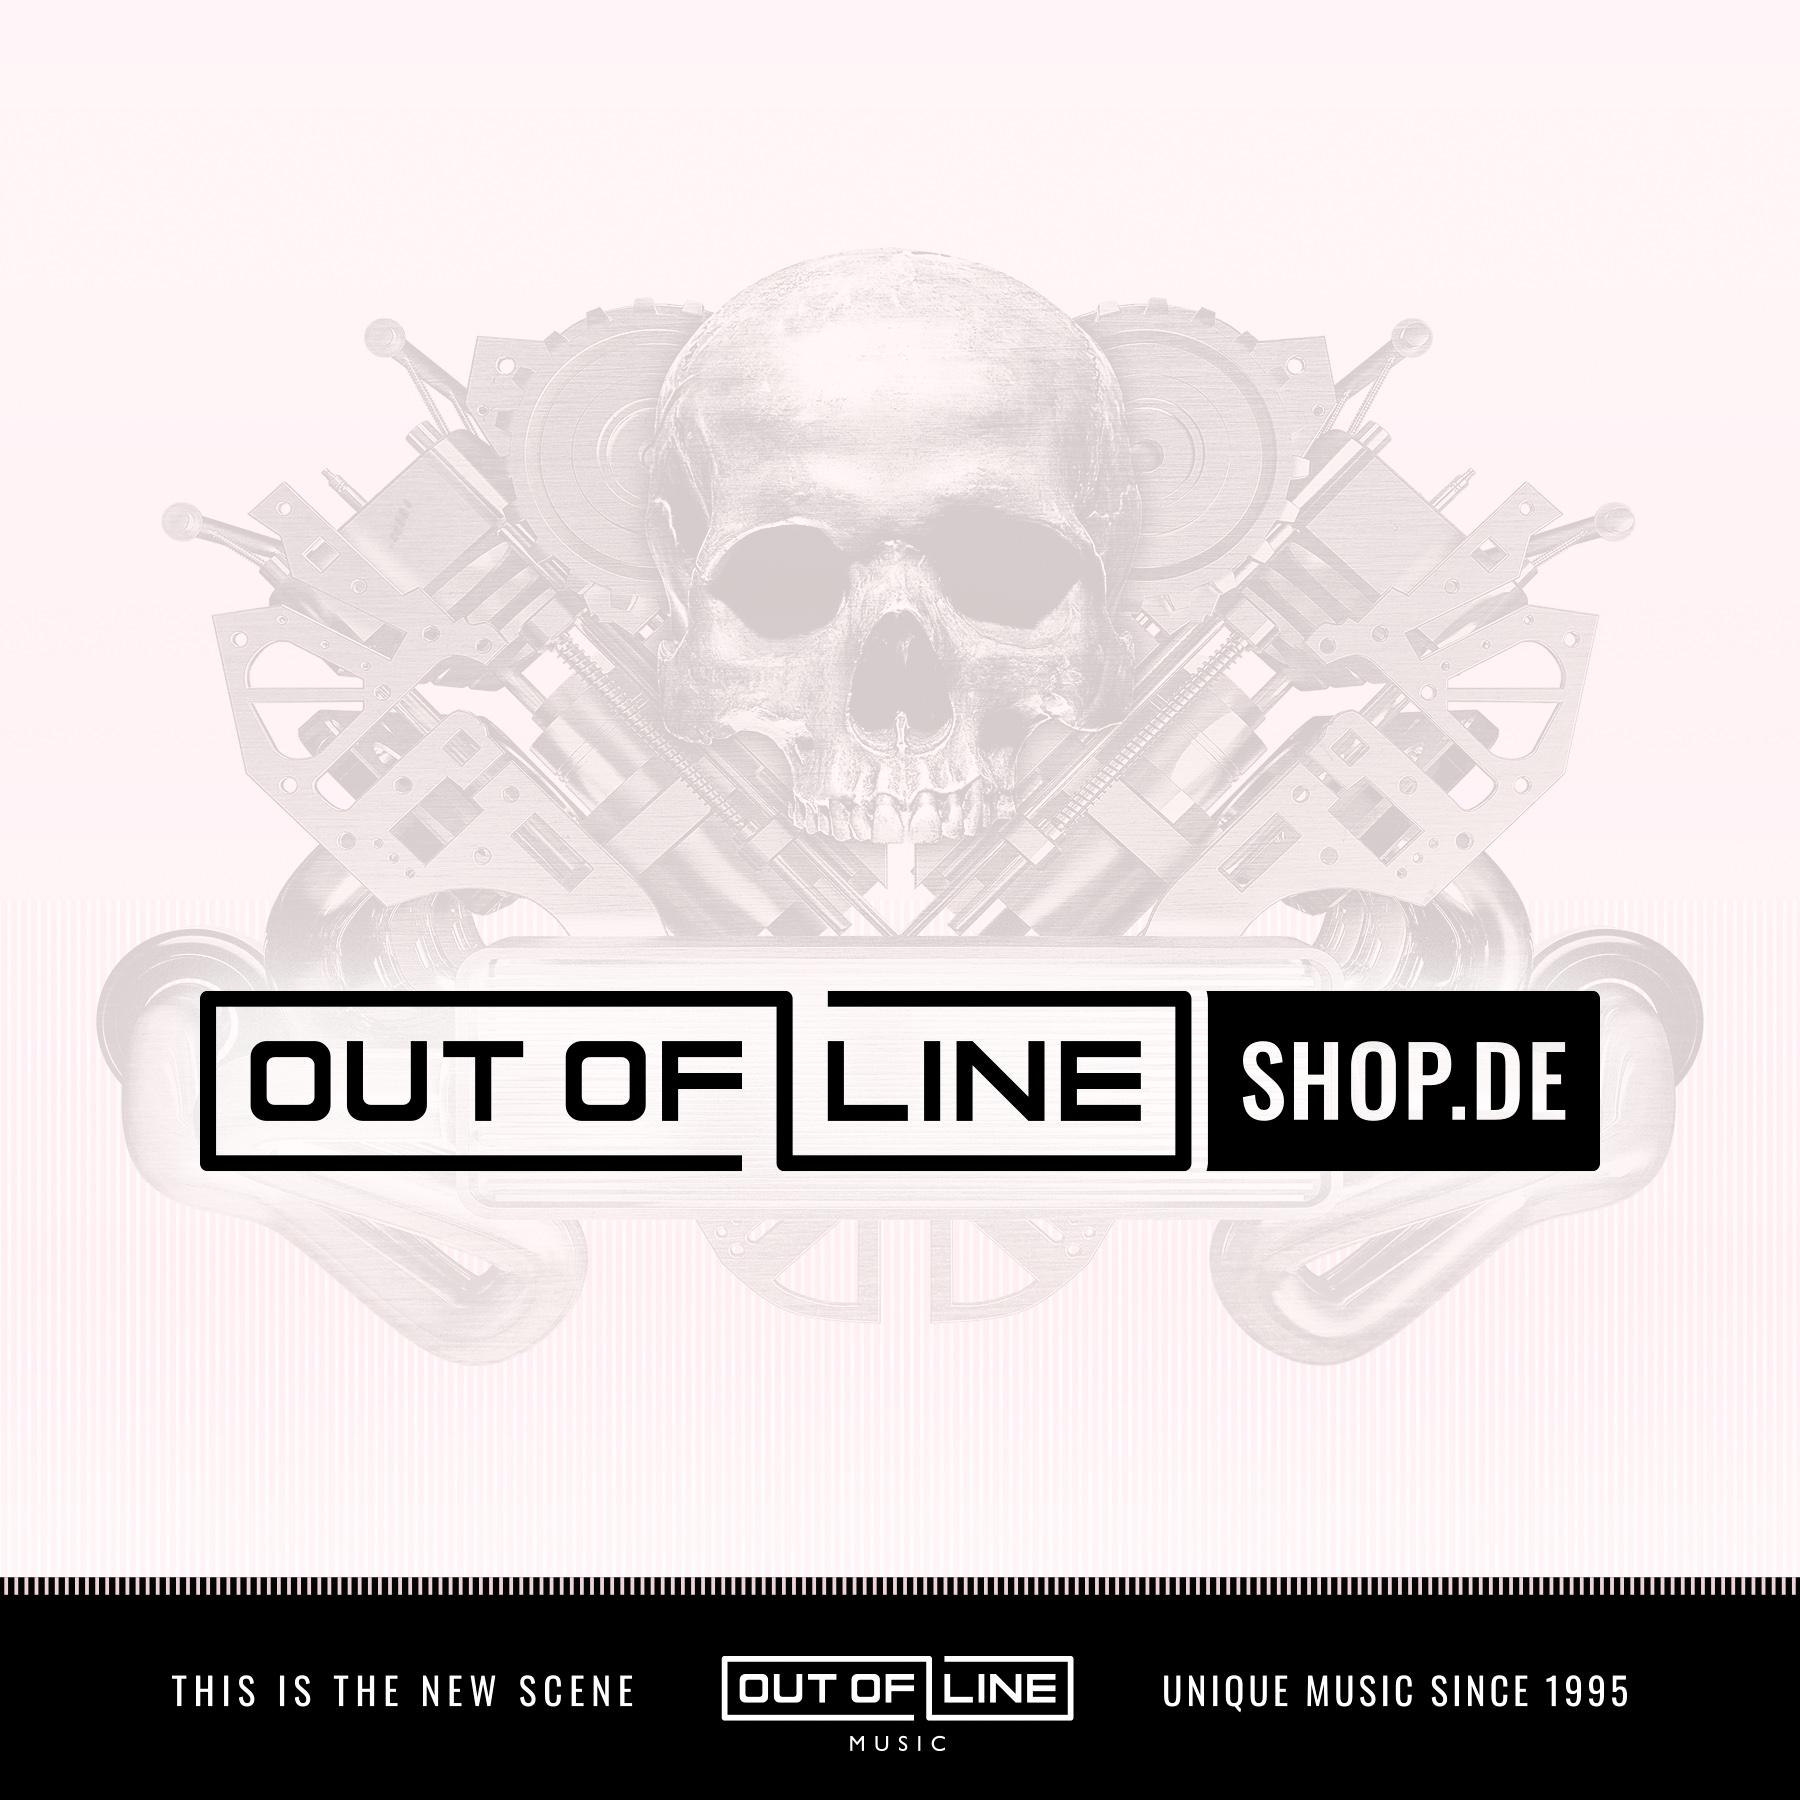 Trentemöller - Fixion (Limited Edition) - 2LP + MP3